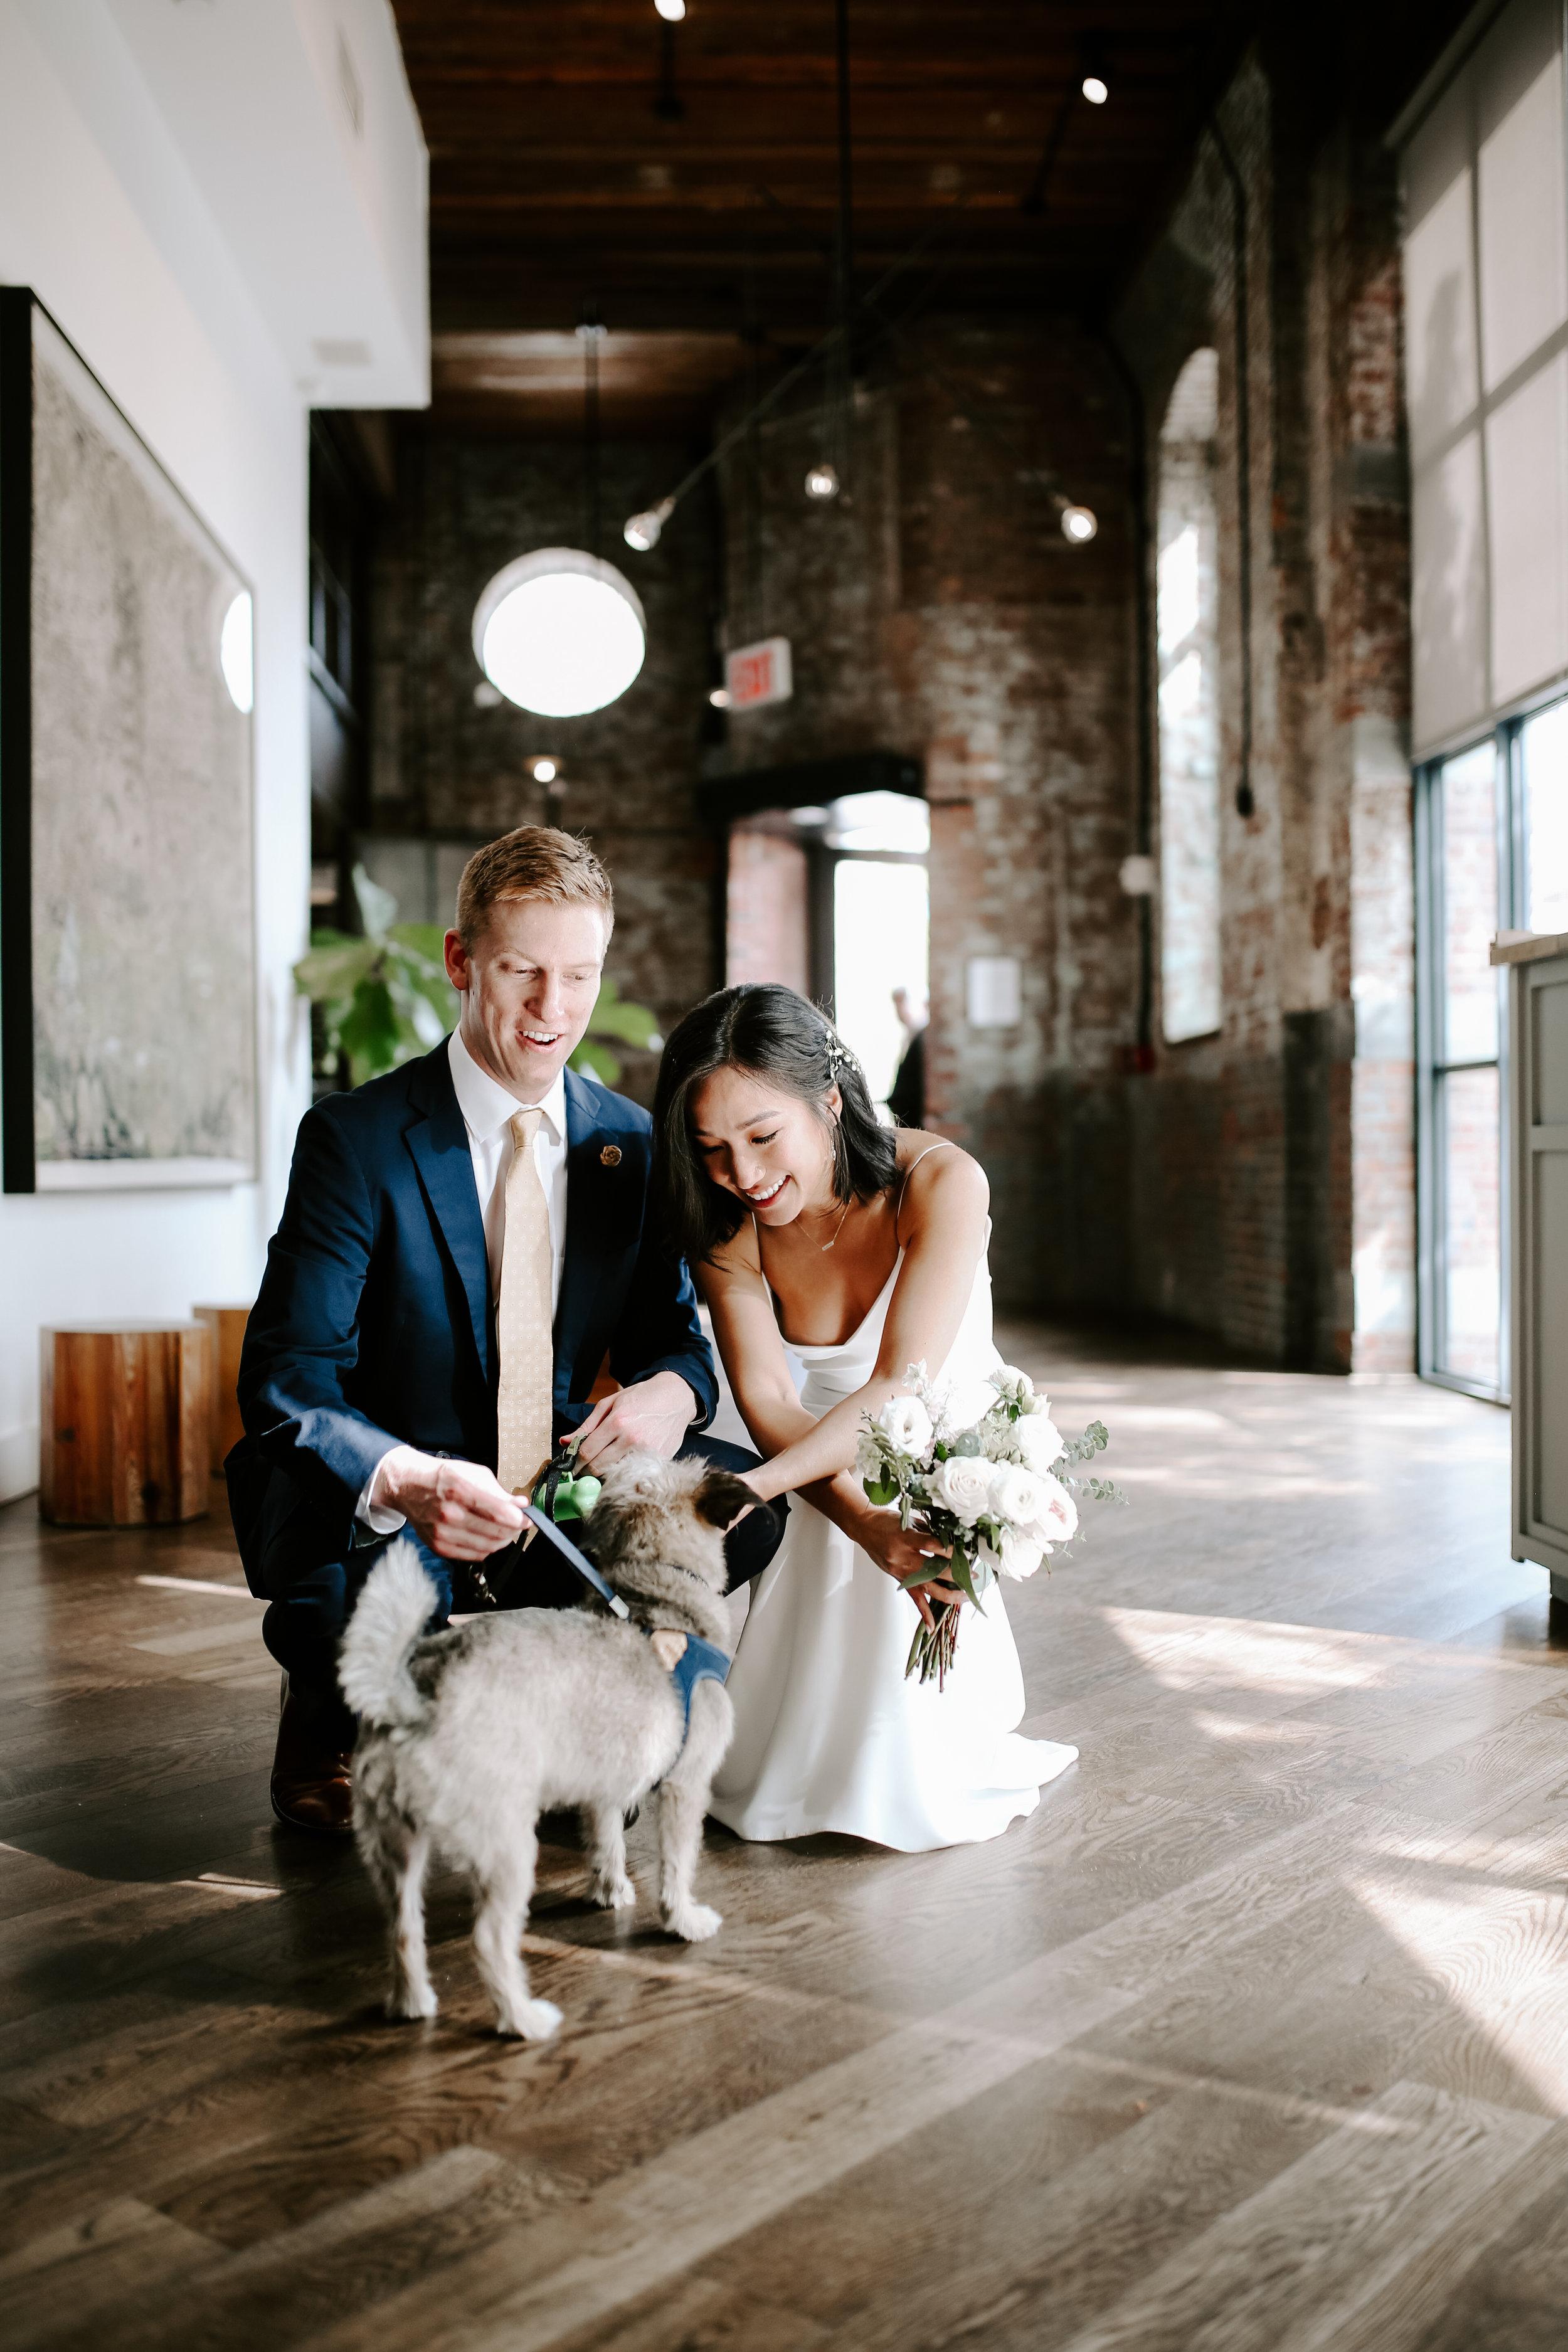 TheNichols_Married_2019-1-67.jpg